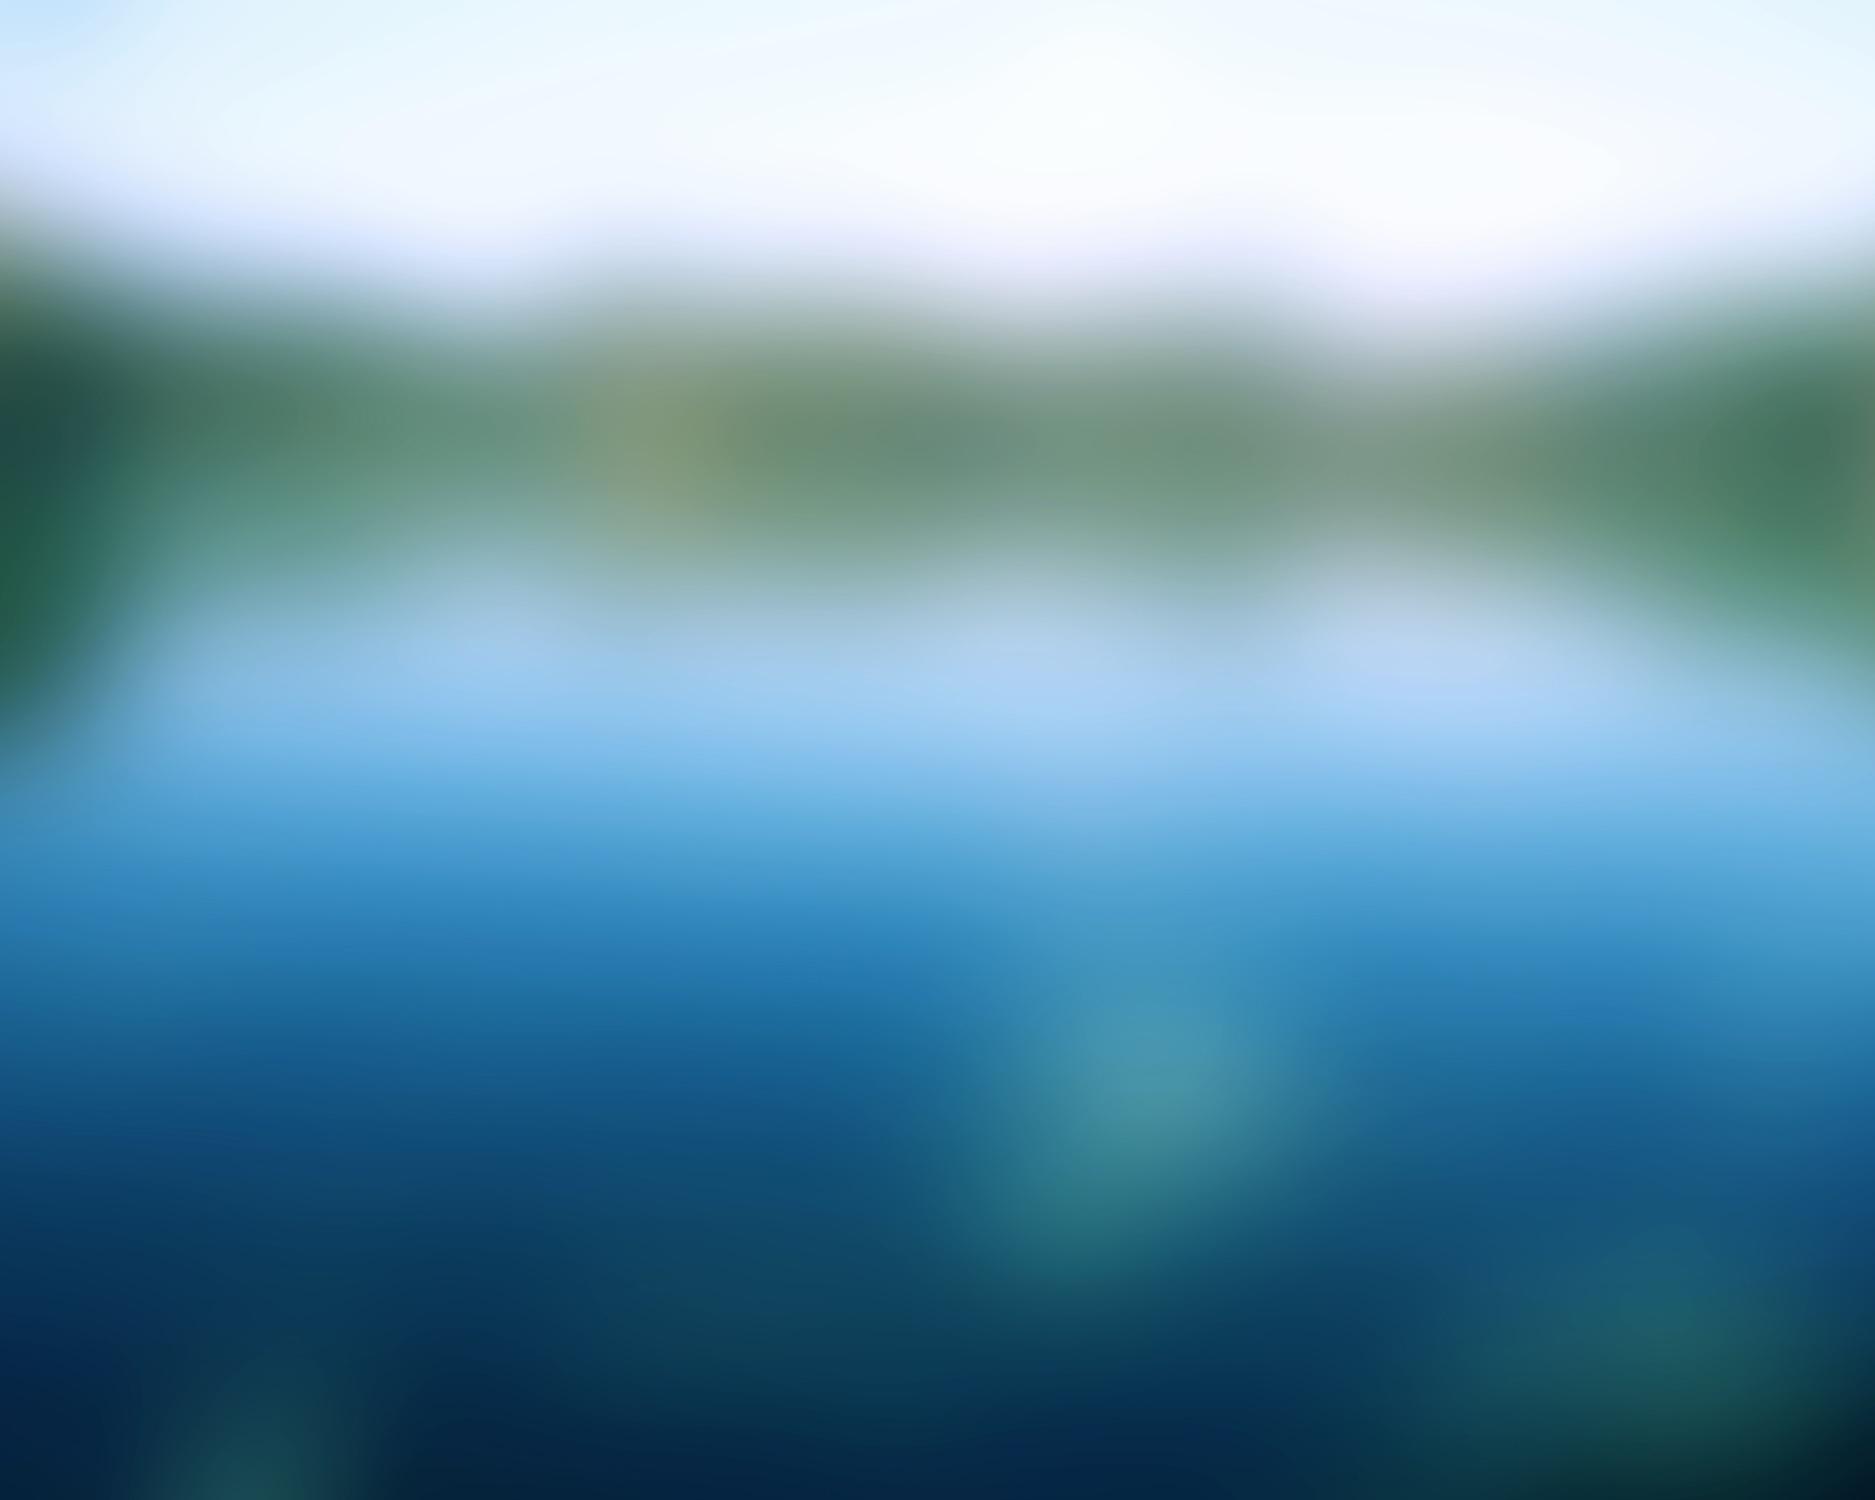 Audubon - Maryland, 2016Increasing Resilience of Transitional Tidal Marsh through Hydrological Adjustments